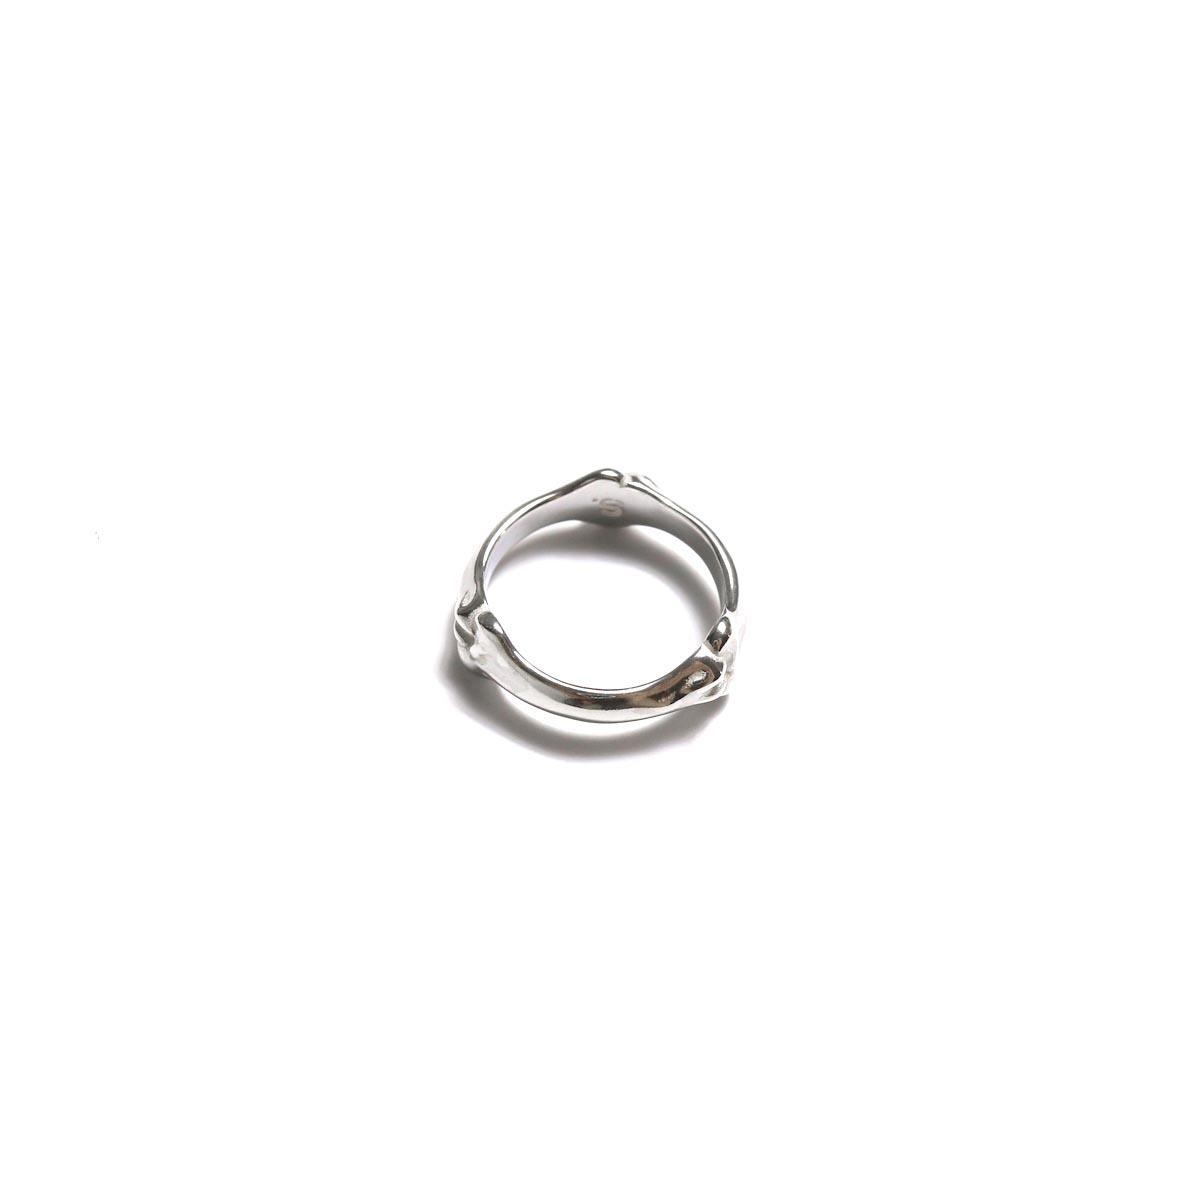 The Soloist / sa.0020AW19 bone shaped band ring.